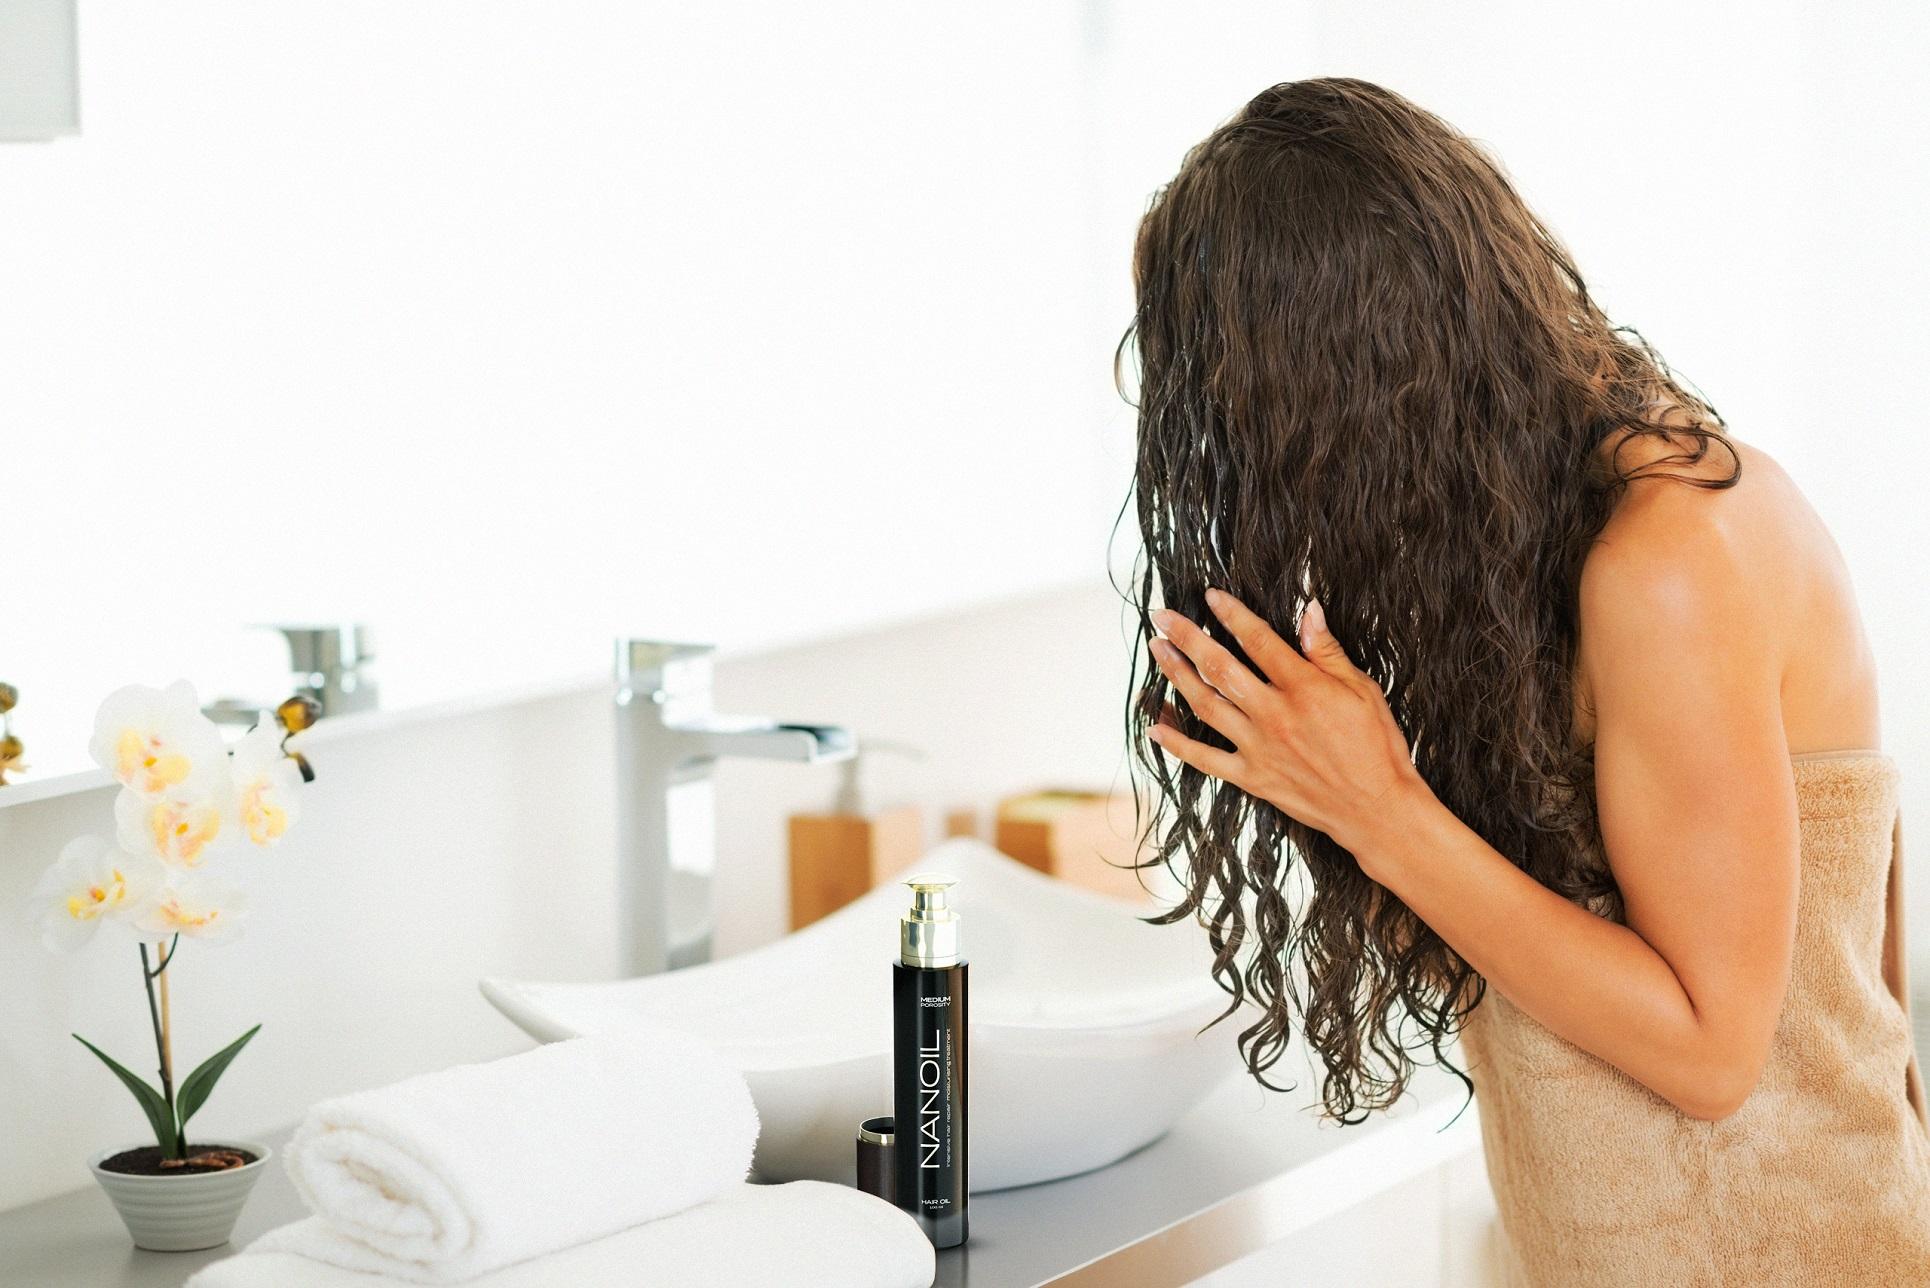 Haaröl Nanoil - Wirkung